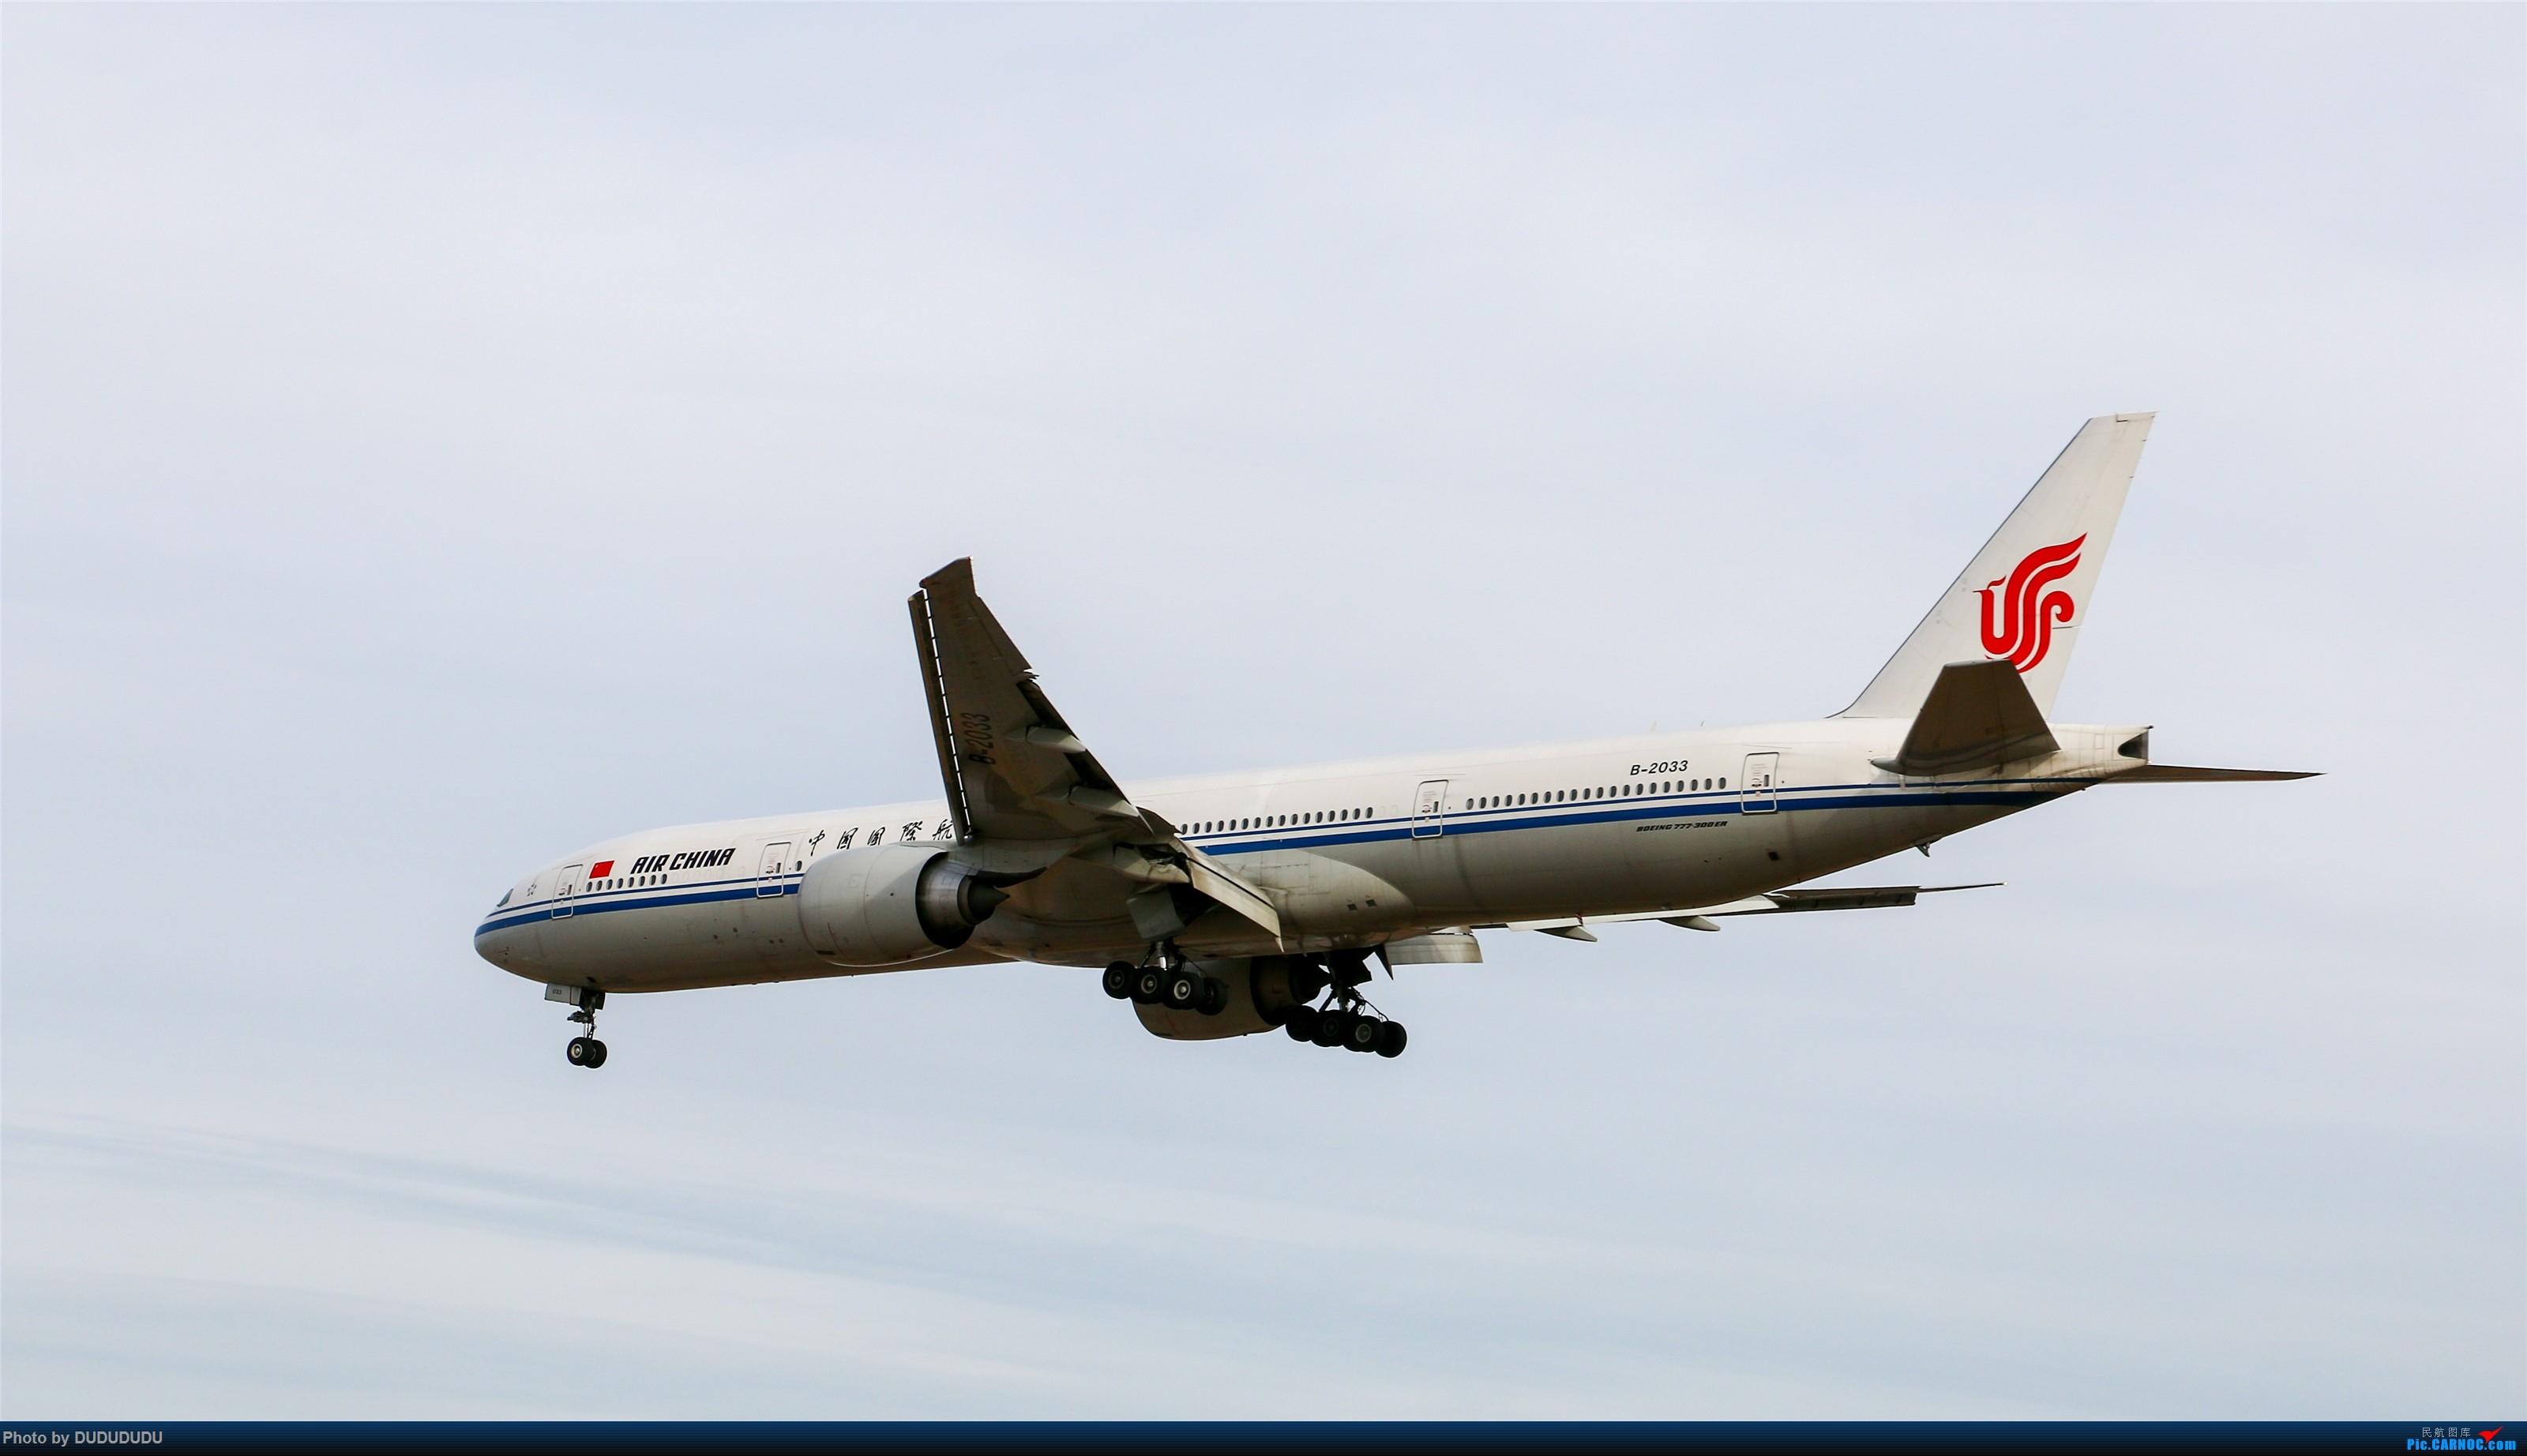 Re:[原创]【DUDUDUDU】从小白走来的这一年…… BOEING 777-300ER B-2033 中国北京首都国际机场